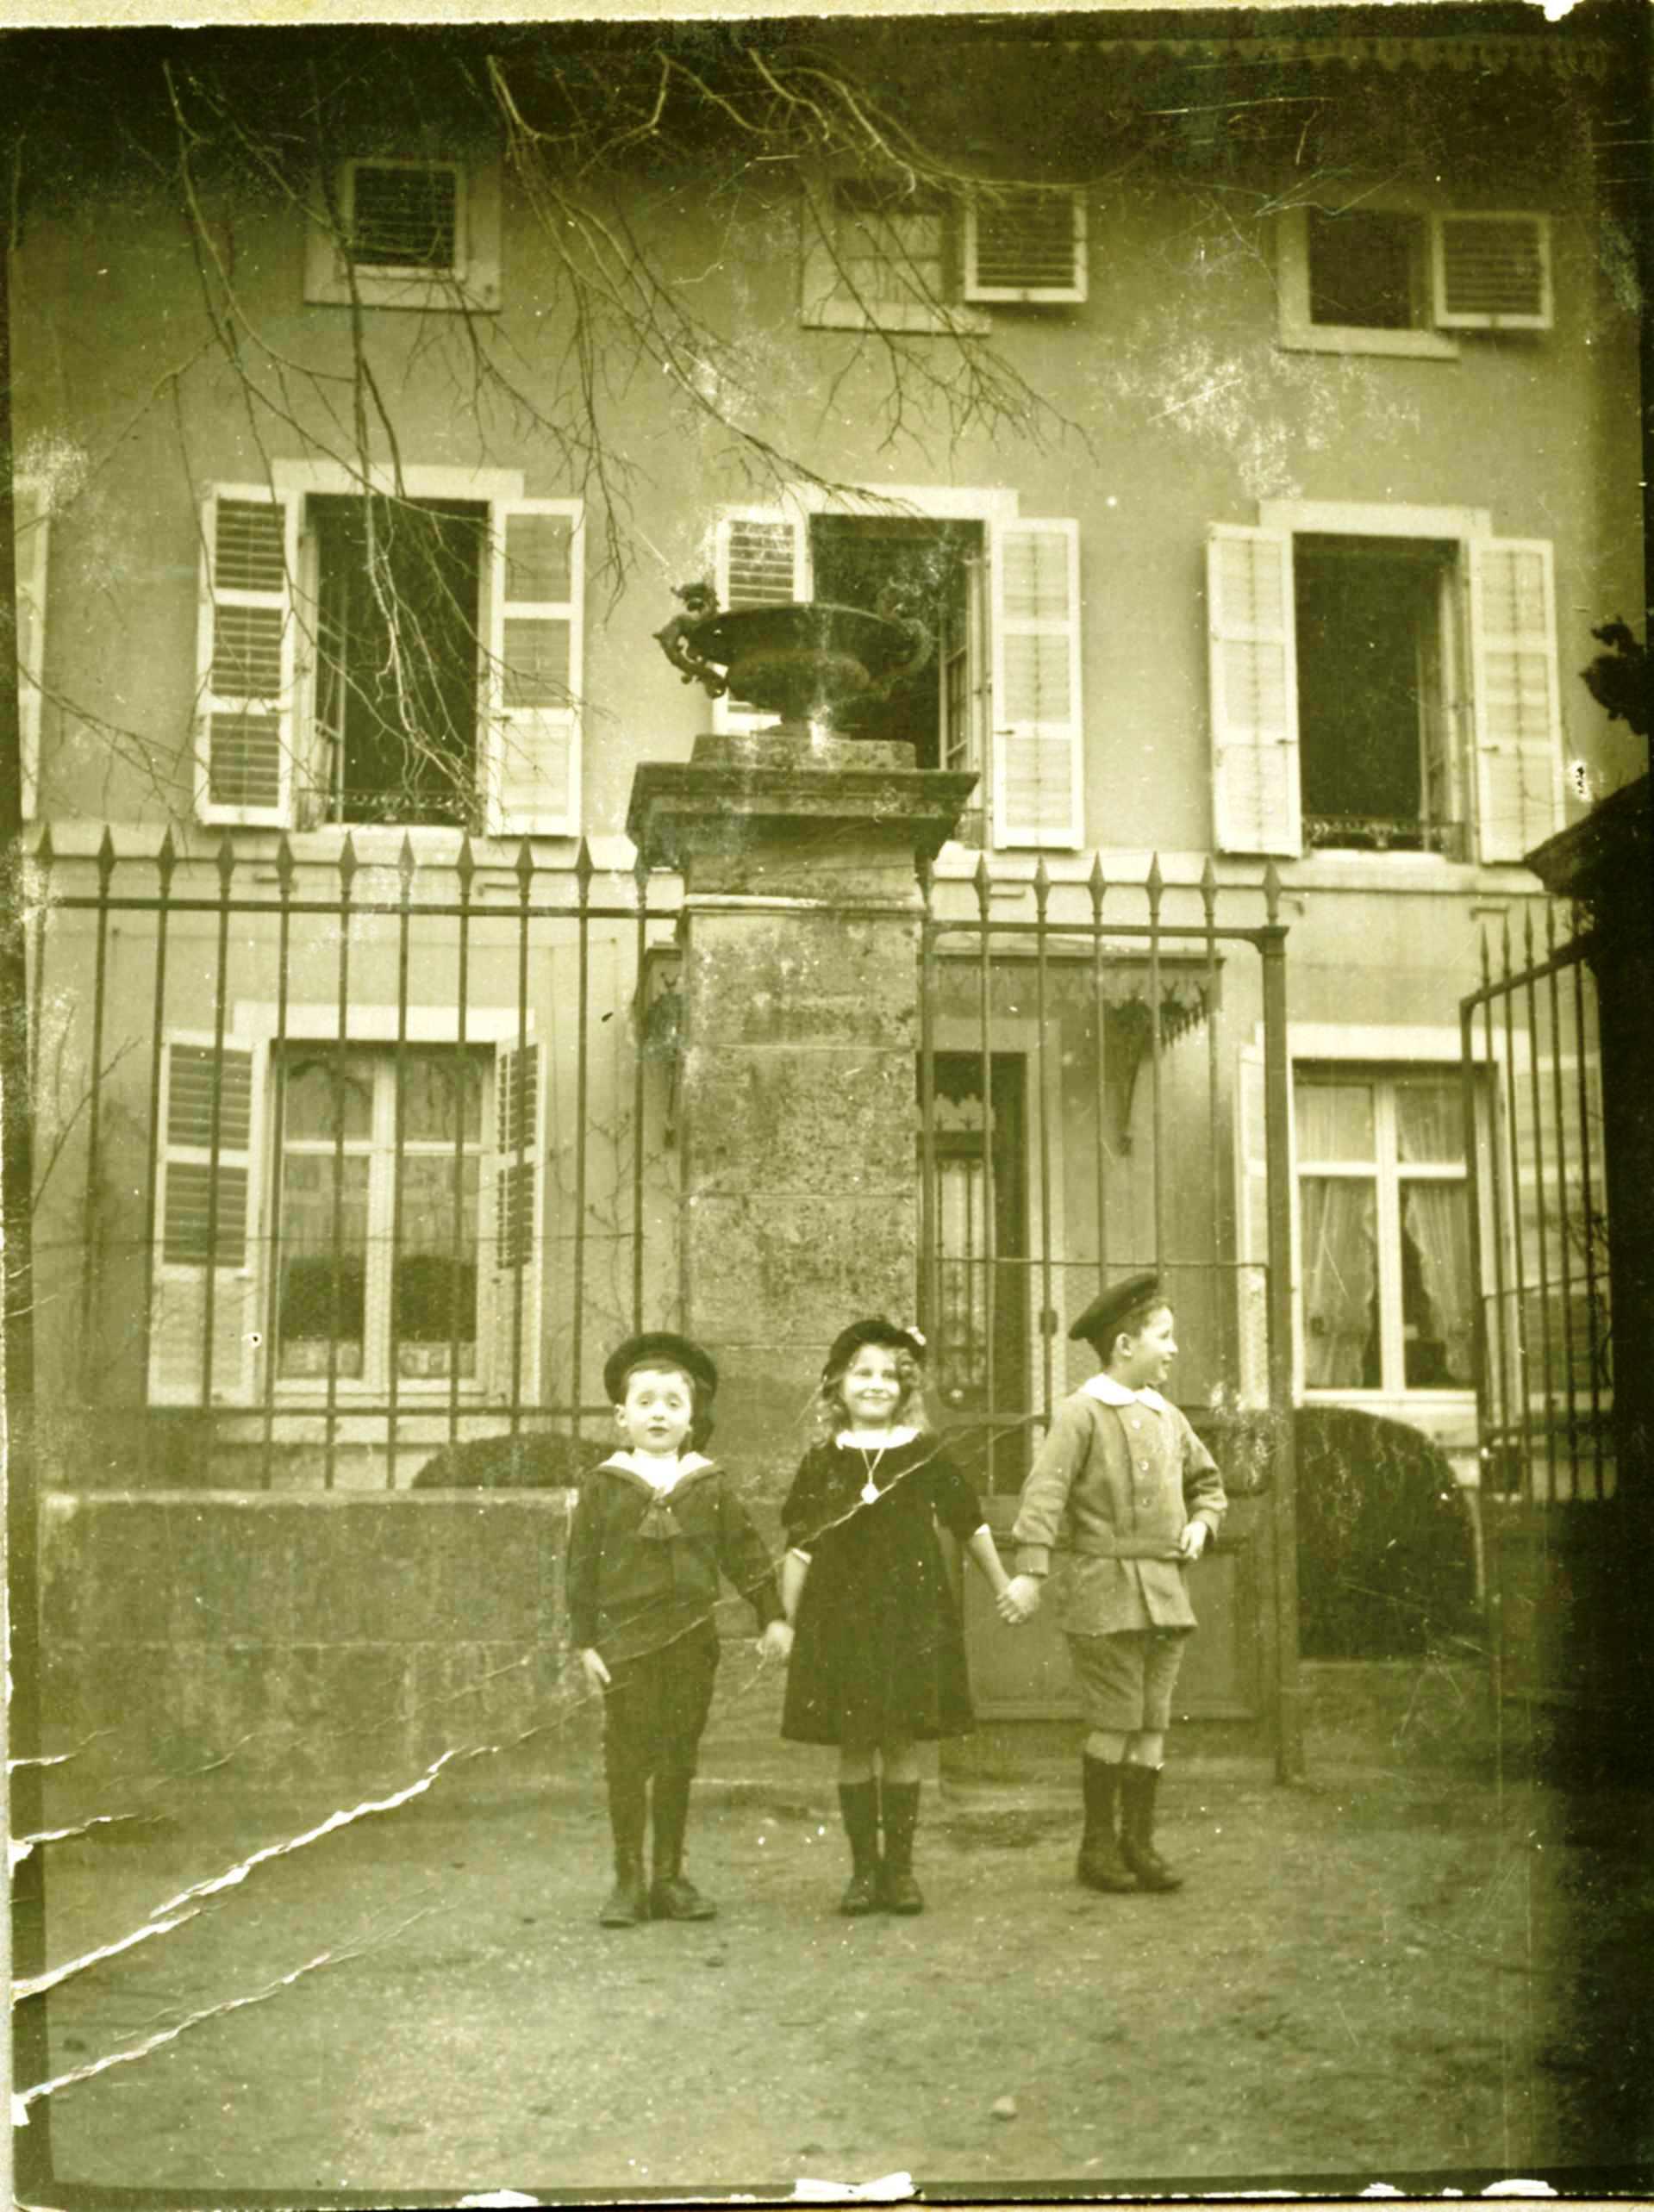 1915-2-Enfants Cuny devant maison-030 Corrigee.jpg